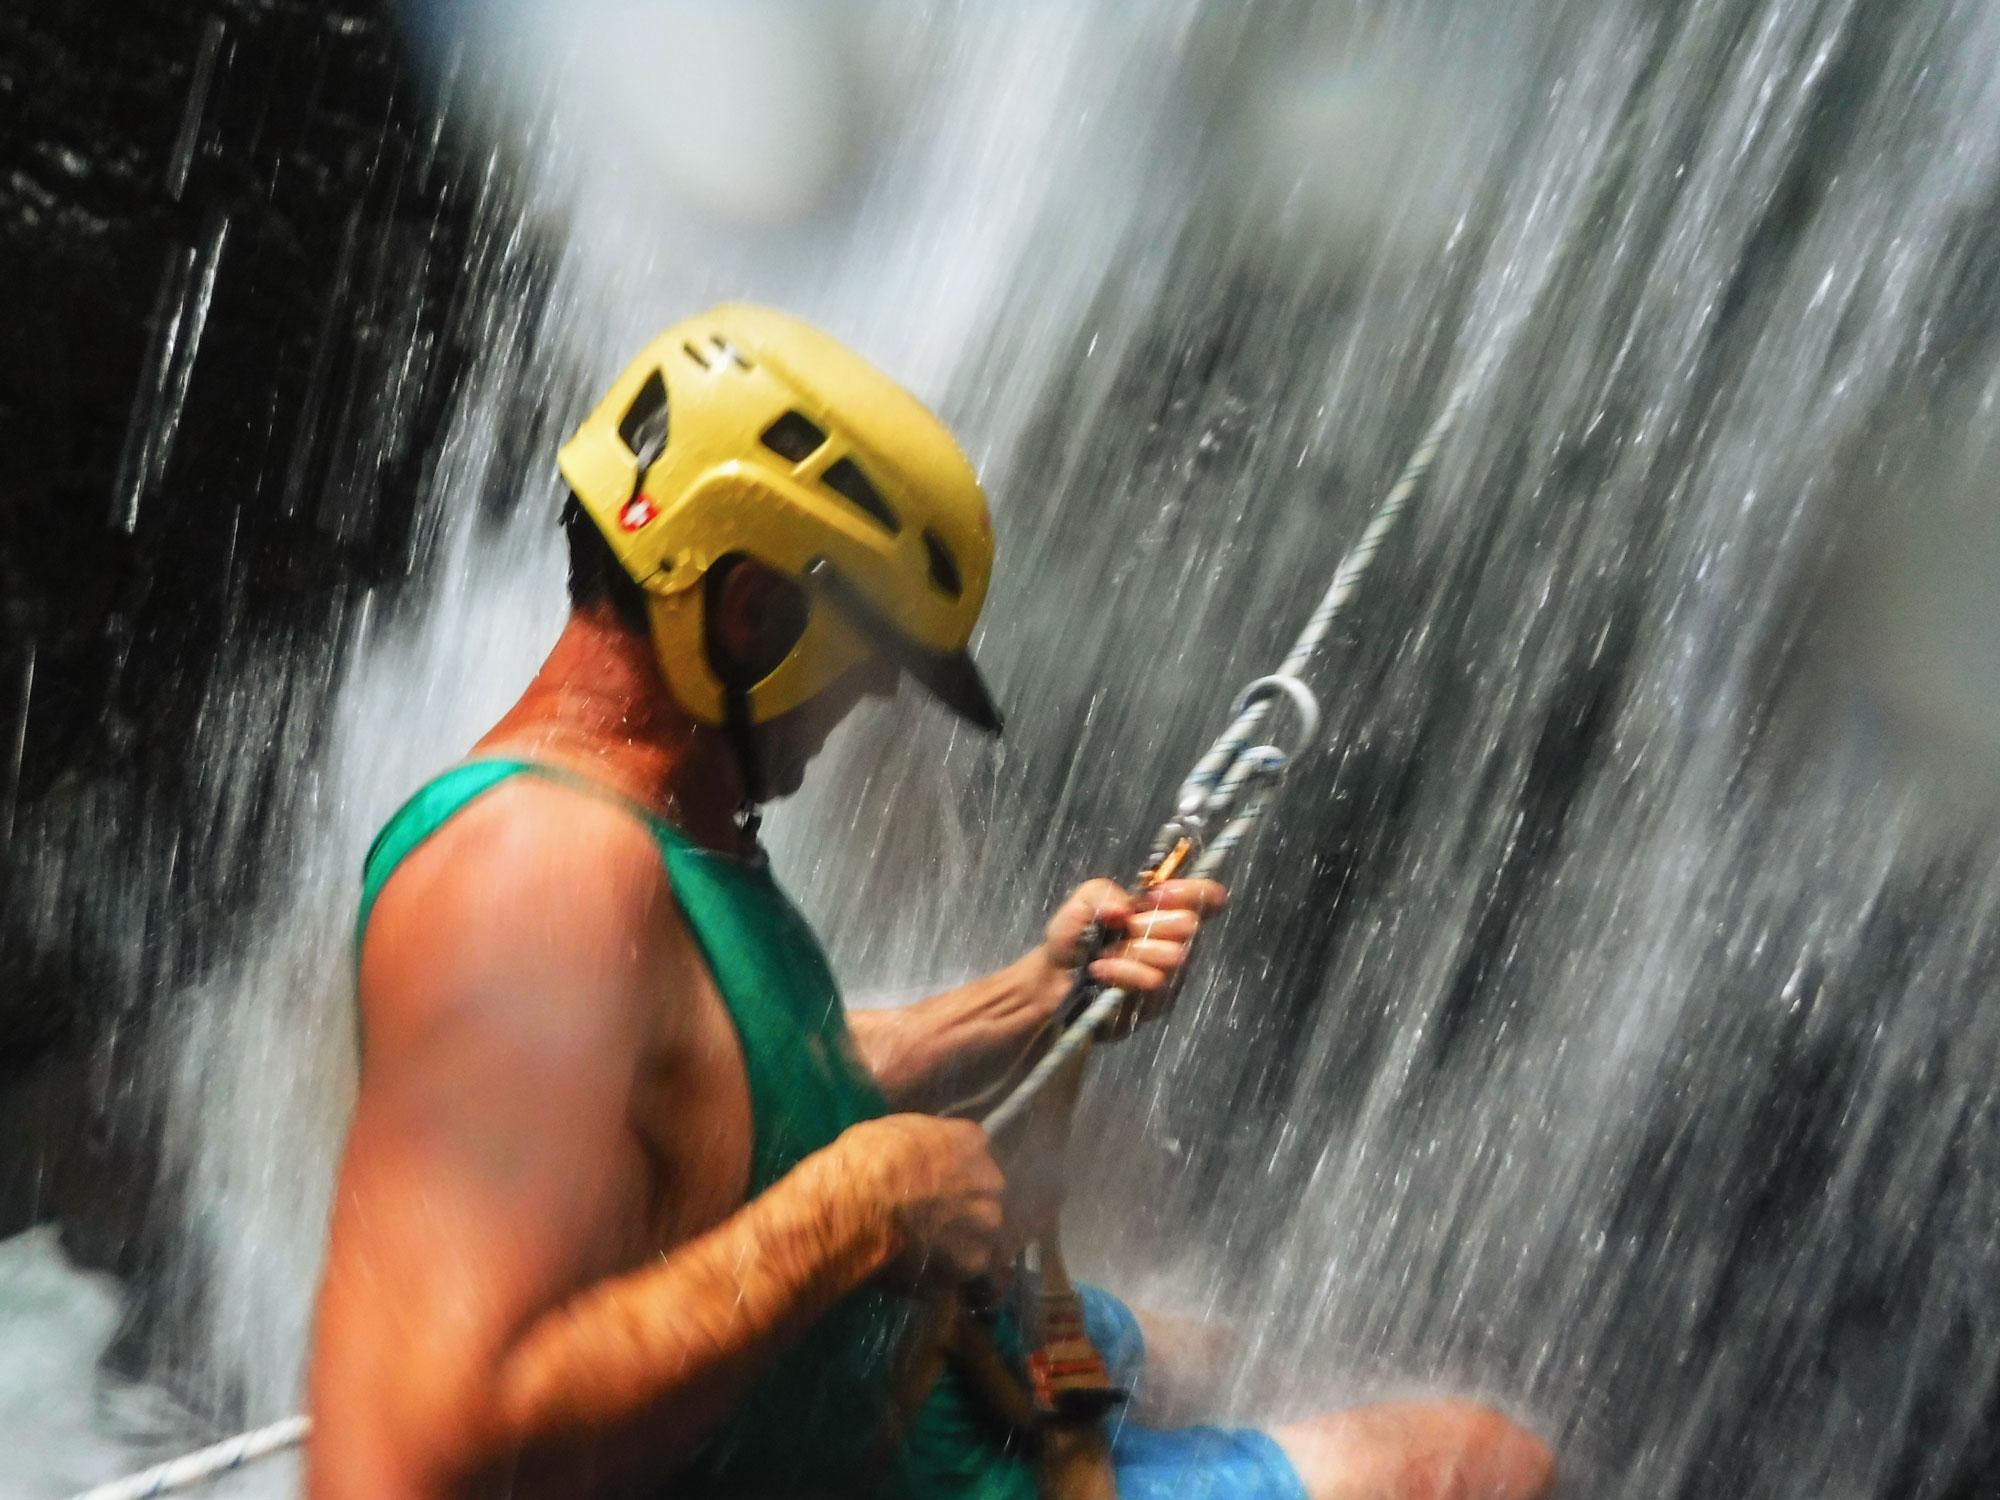 uvita-costa-rica-wander-south-rapelling-lamar.jpg